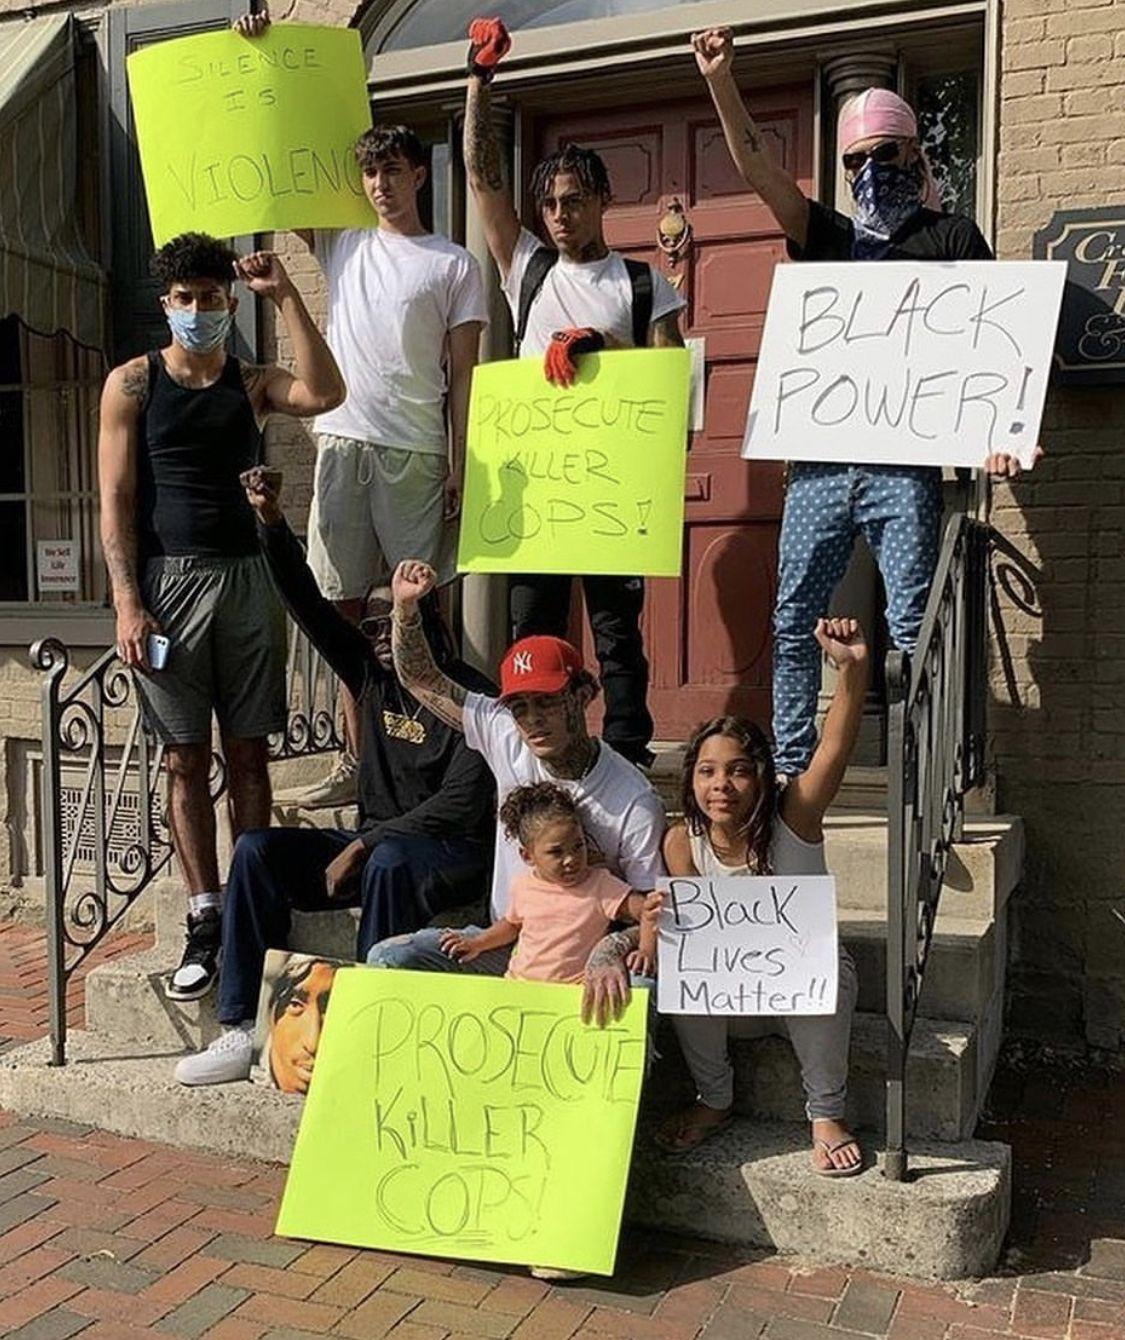 Pin By Maya On Lil Skies Lil Skies Black Lives Matter Lives Matter